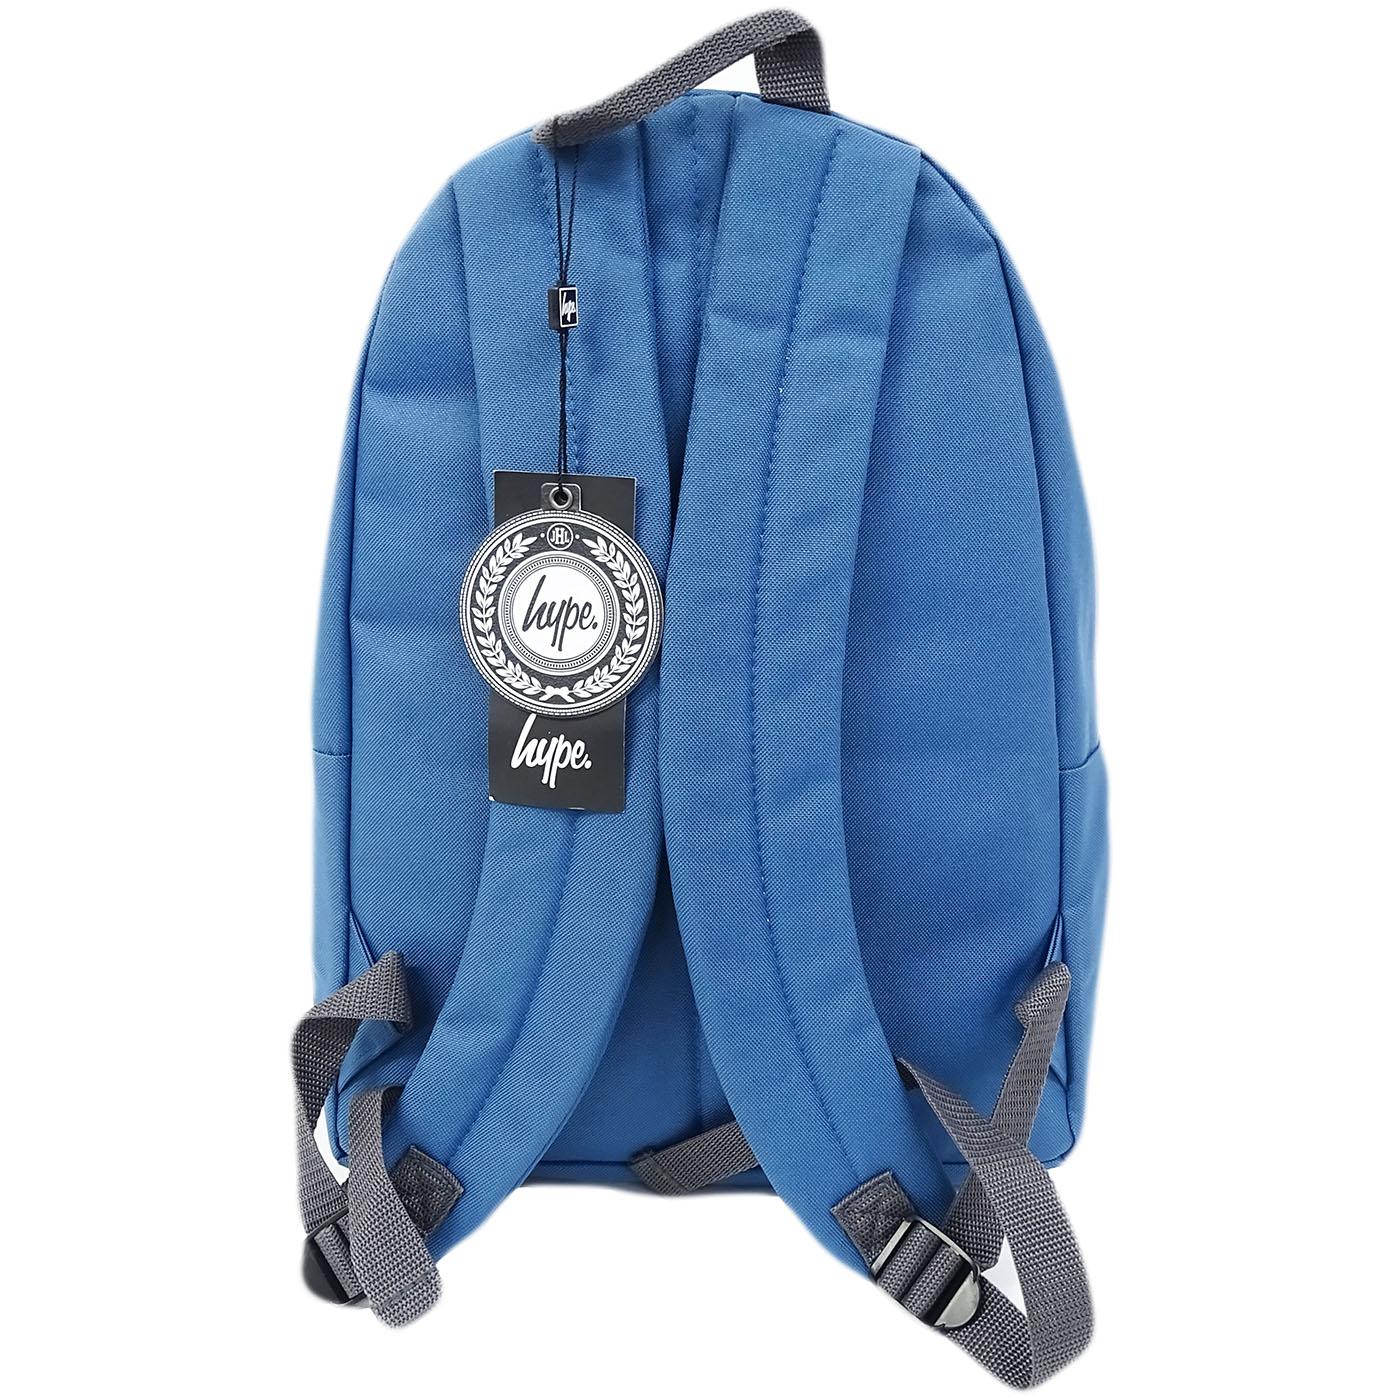 Unisexe-Hype-Sac-A-Dos-Ecole-Gym-SACS-pochettes-pencil-case miniature 143